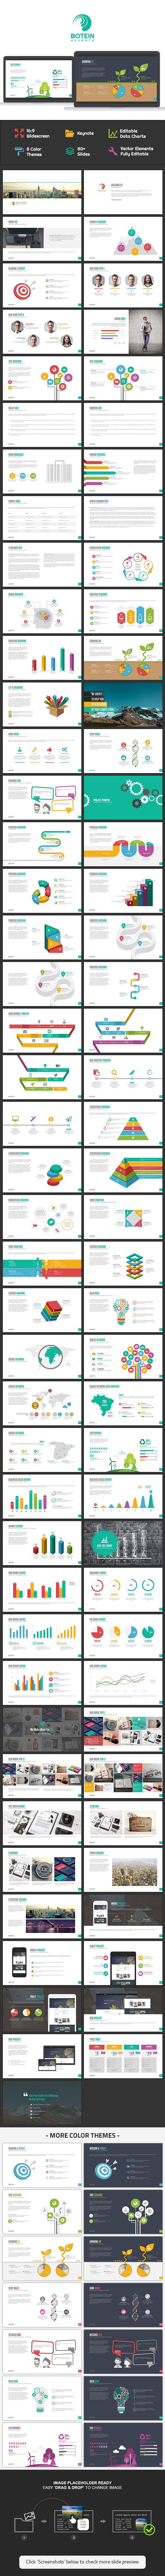 Botein Keynote Template - Business Keynote Templates